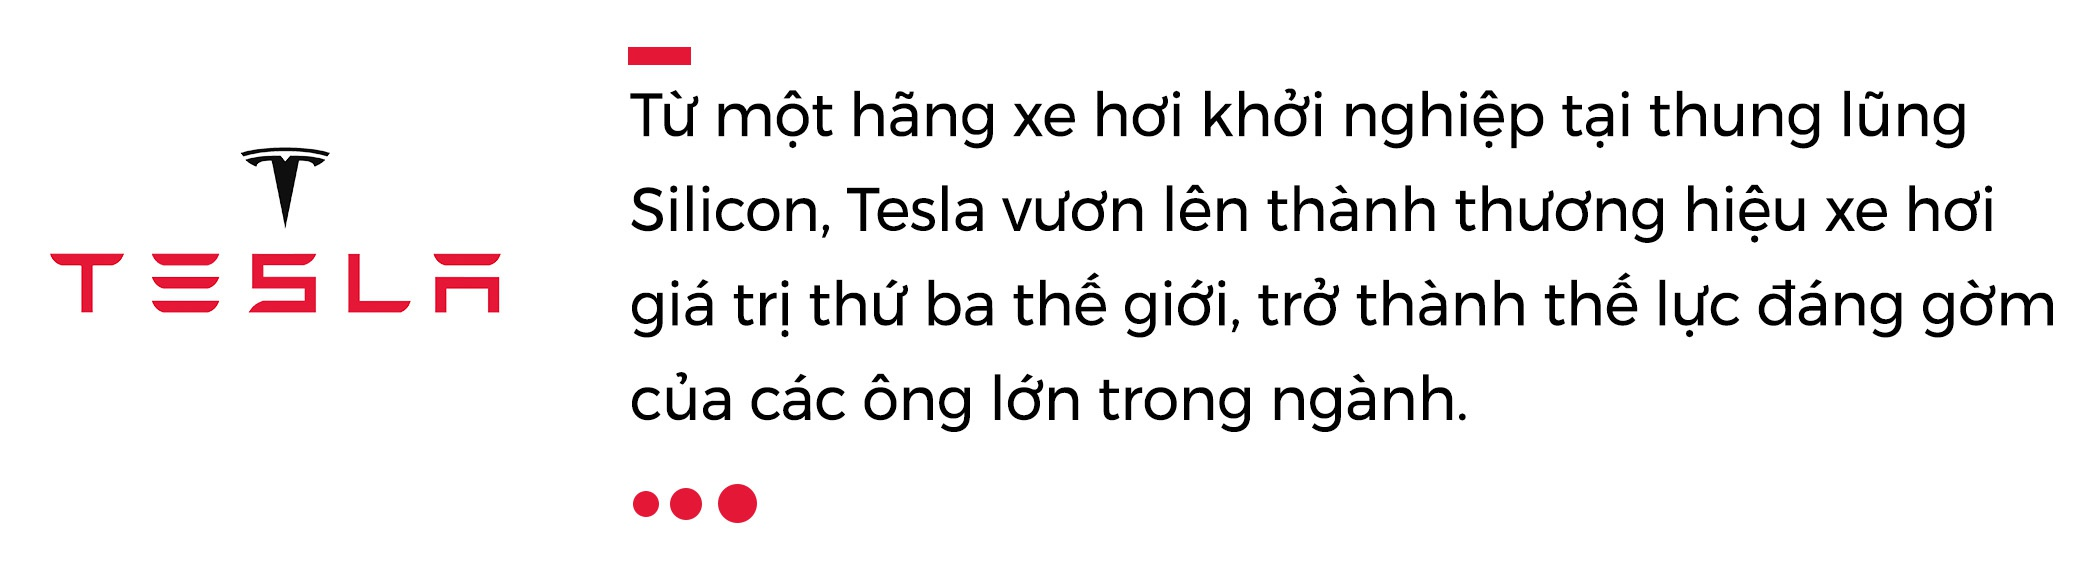 Tesla - hang xe dien thay doi lich su nganh xe hoi toan cau hinh anh 1